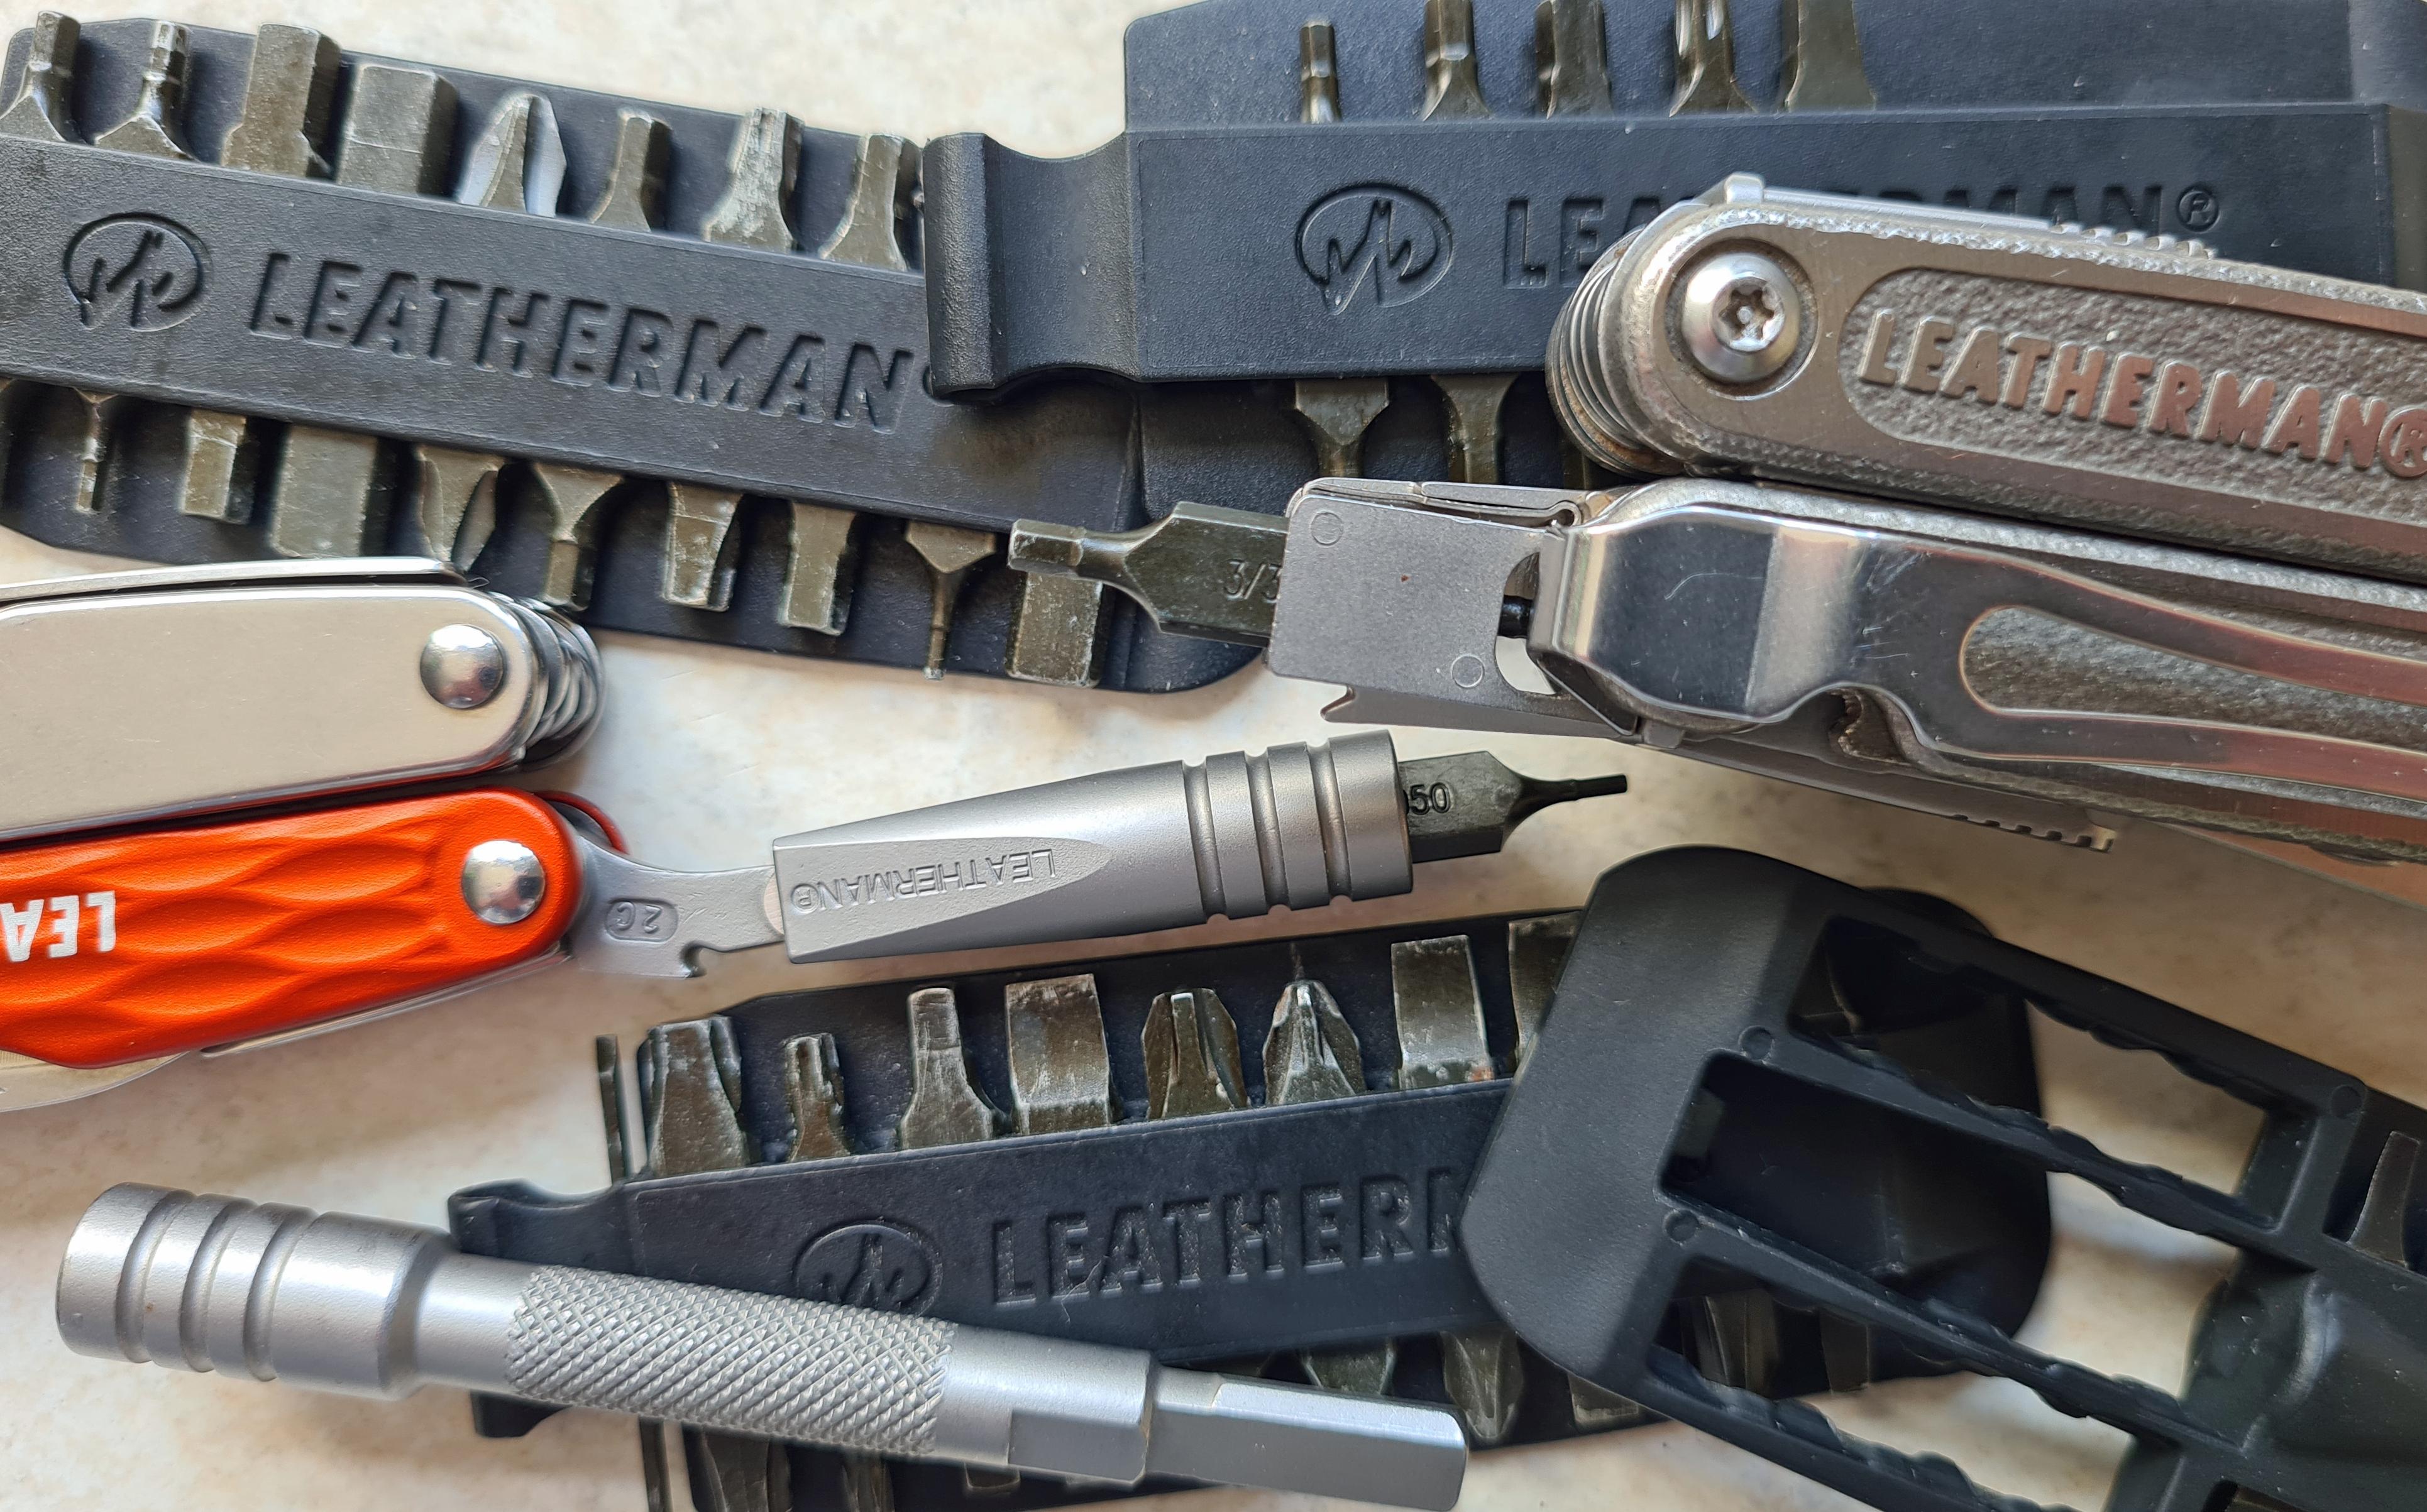 Leatherman accessories